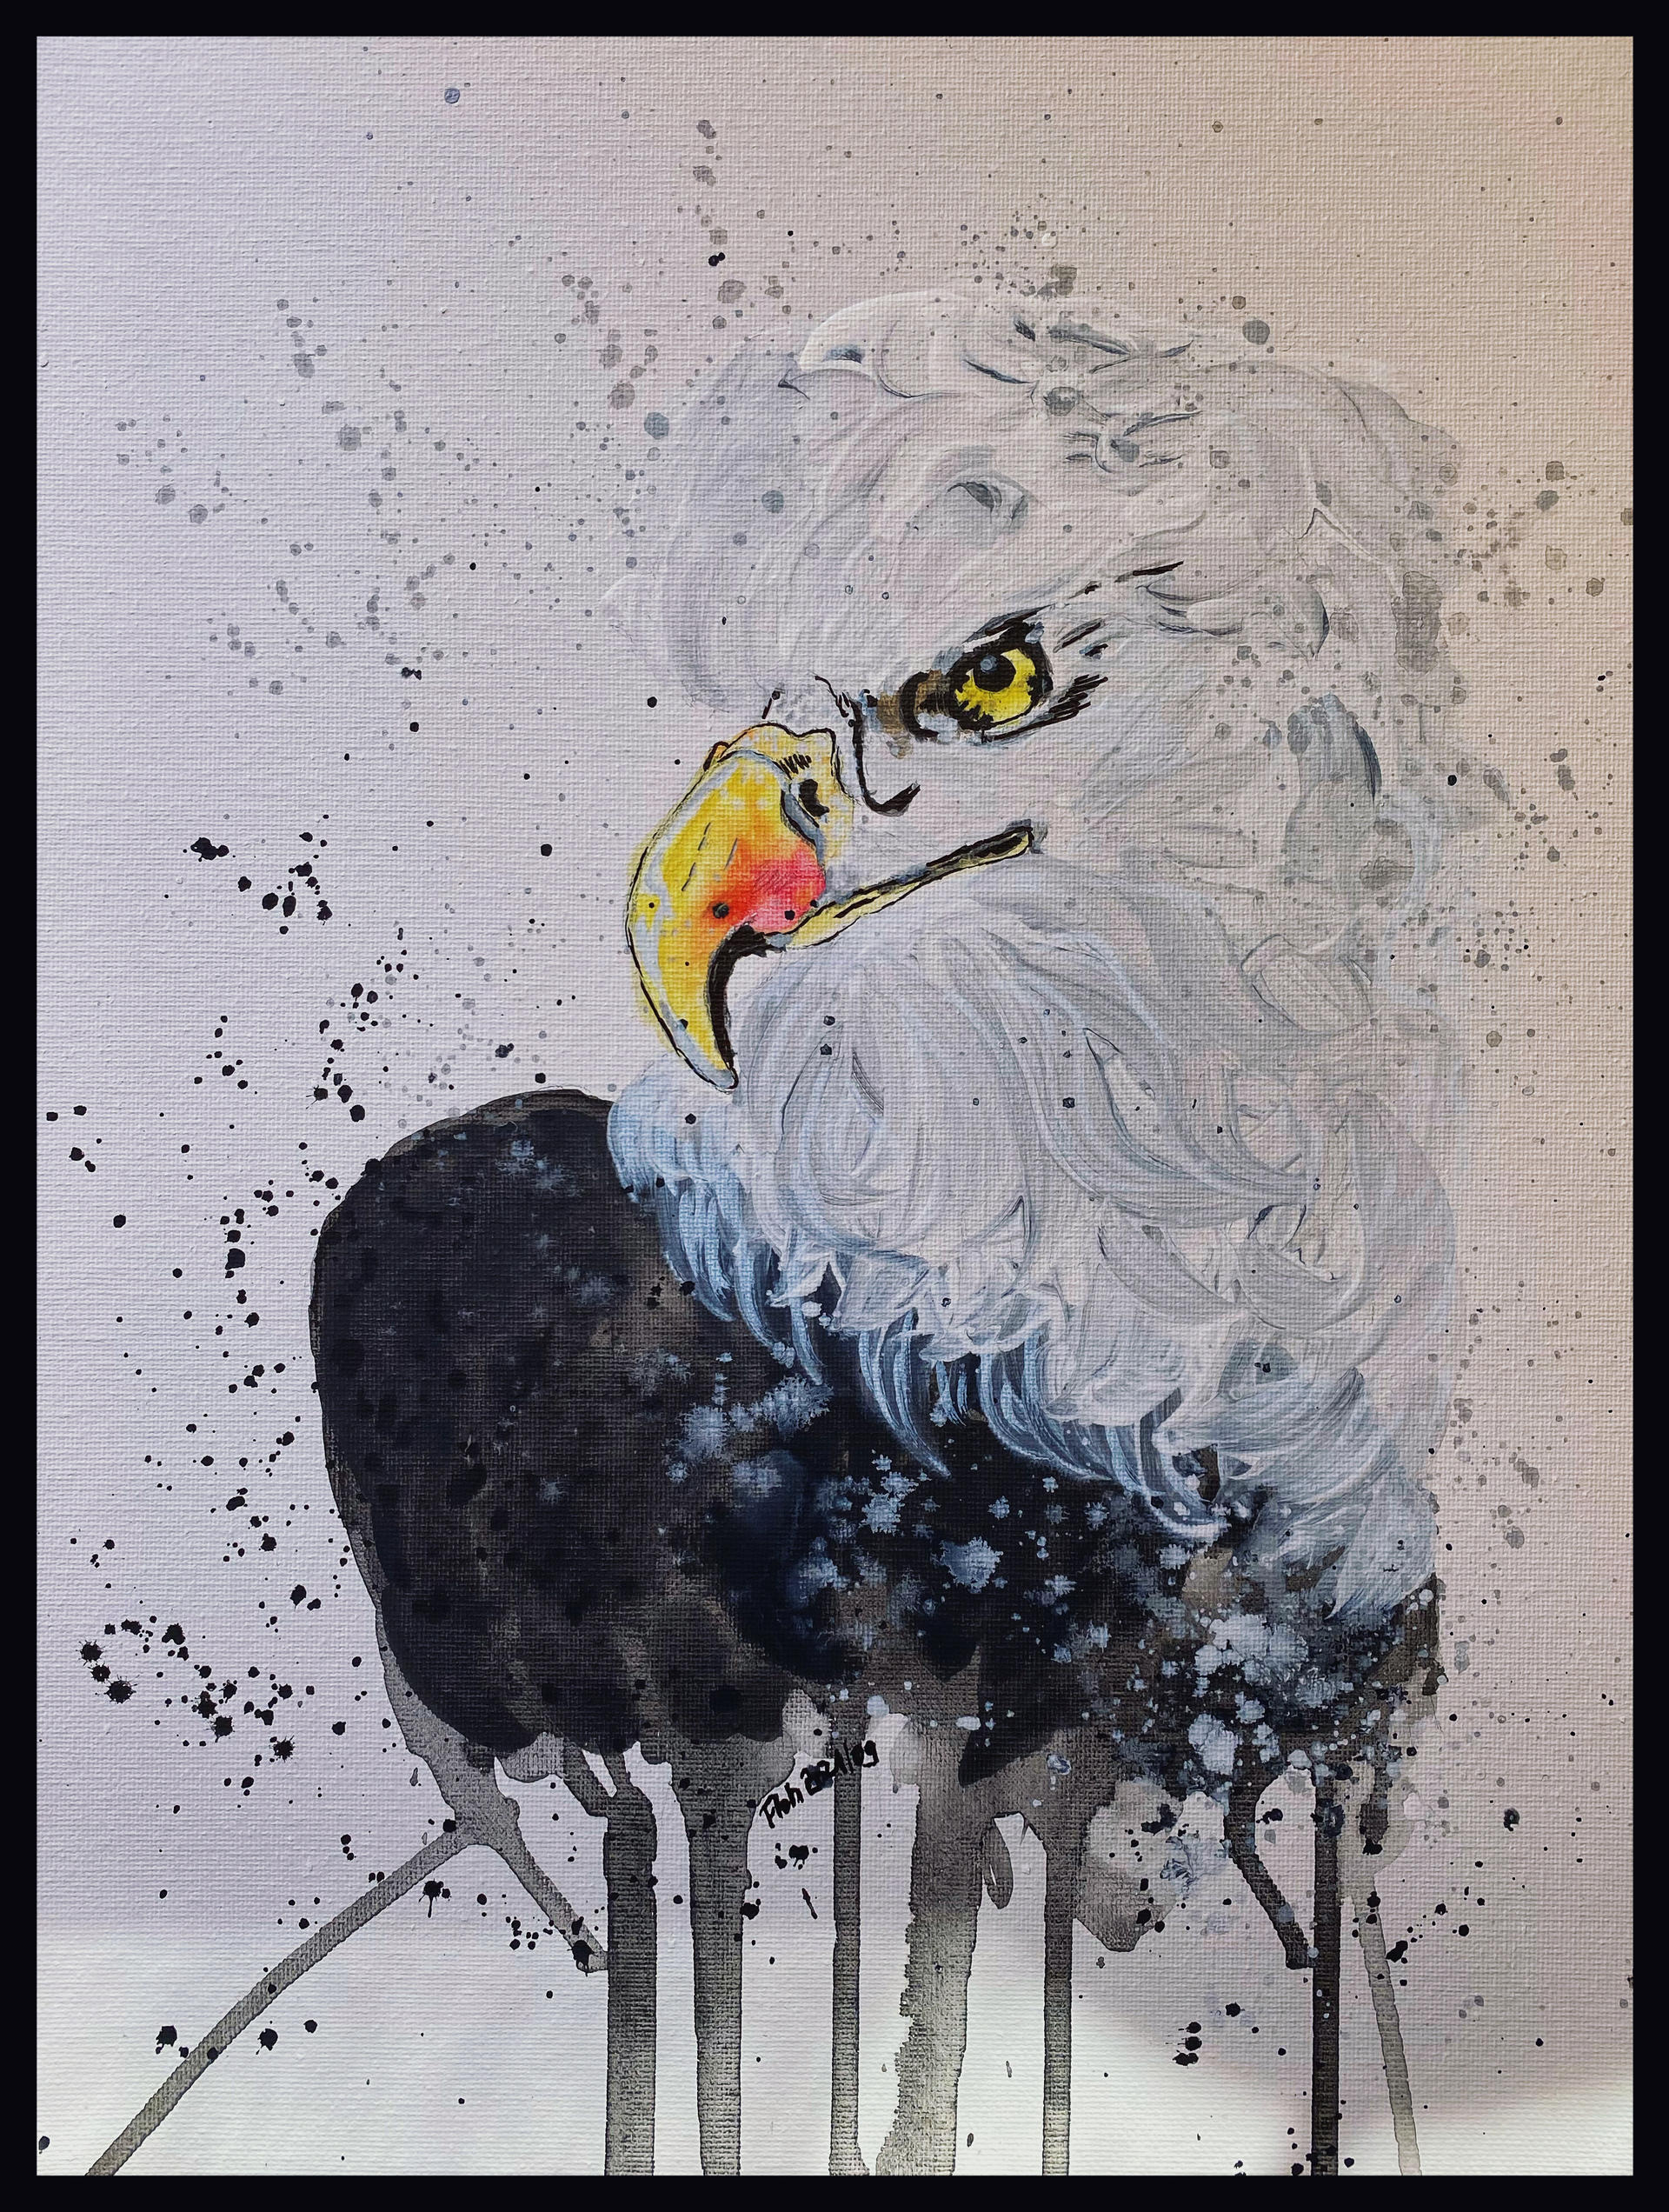 Eagle daddy Axel